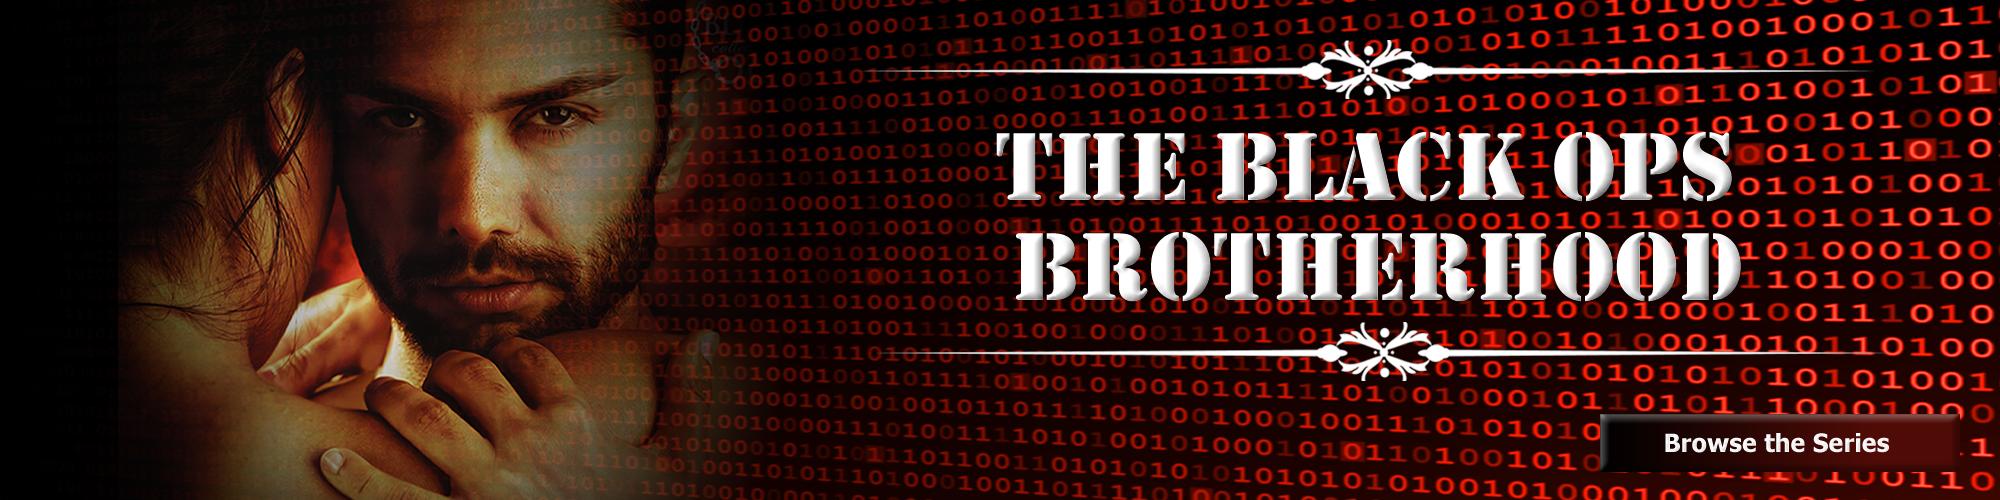 tactical error black ops brotherhood 4 siren publishing classic juarez bella